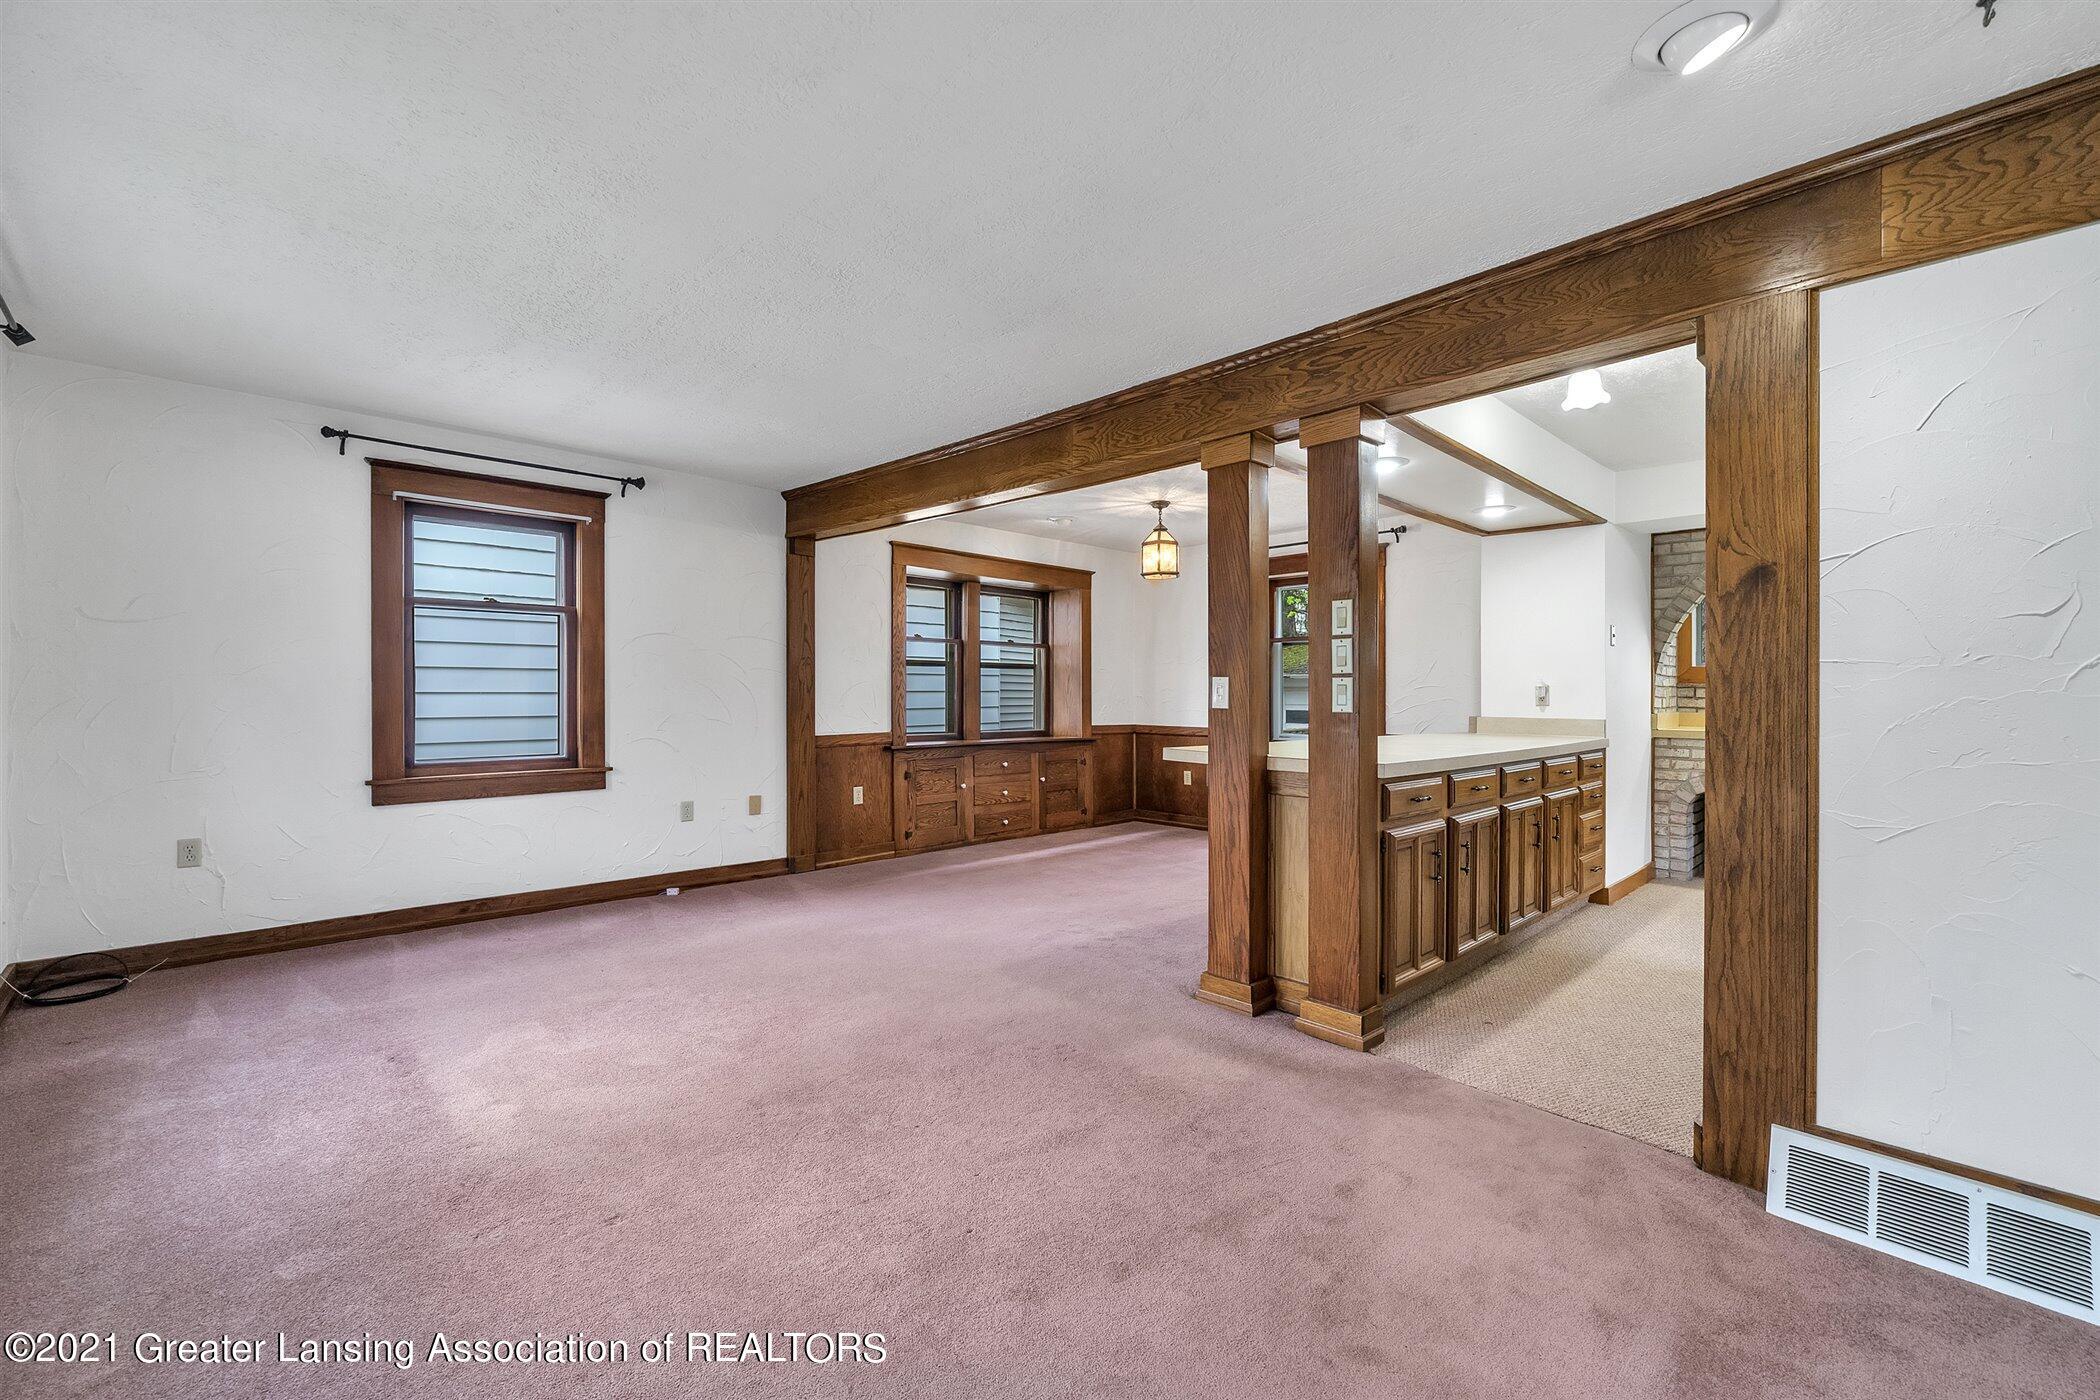 726 N Magnolia Ave - (4) MAIN FLOOR Living Room - 5